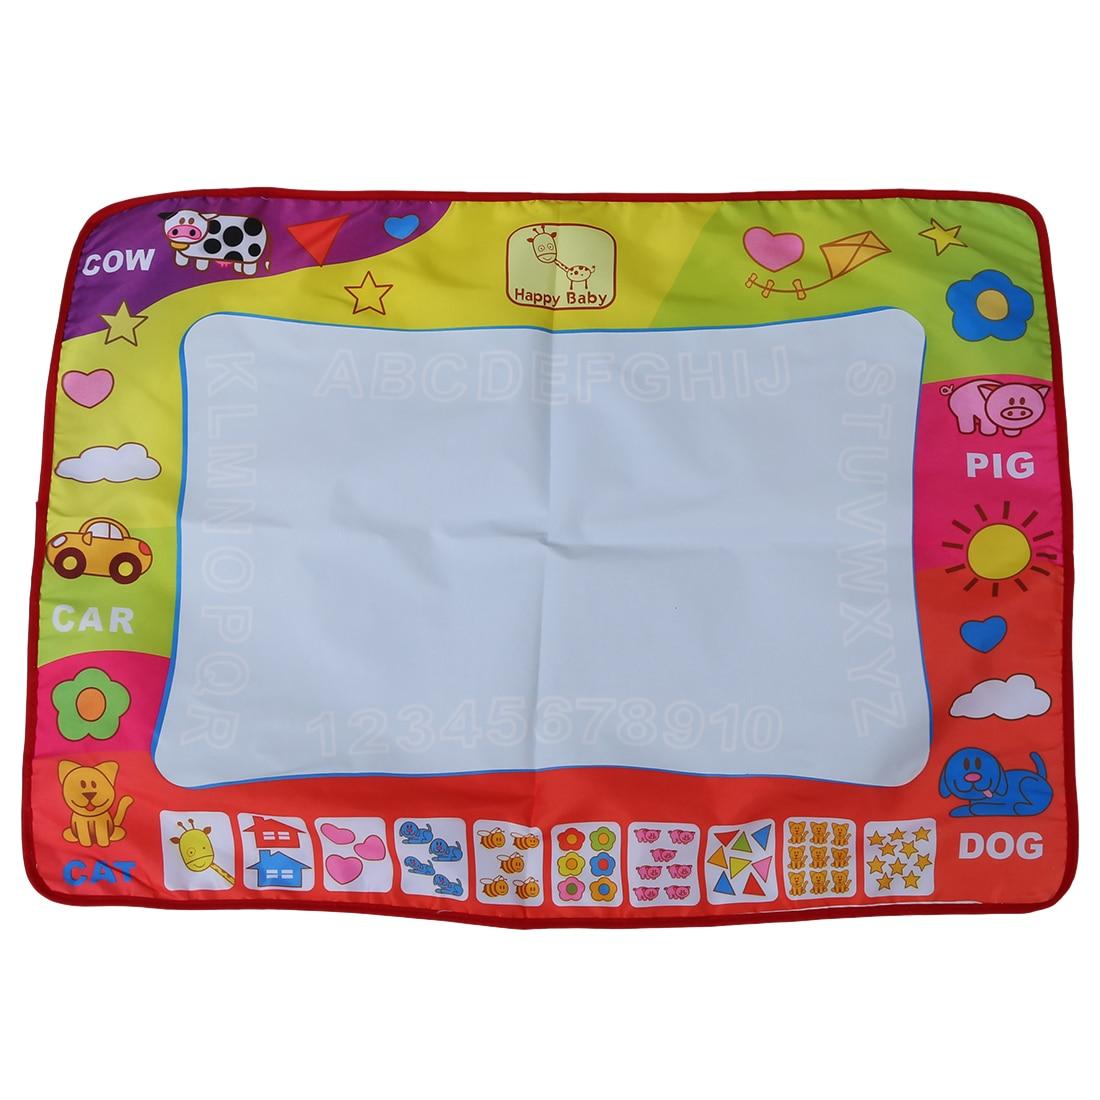 Children Toy Drawing Mat Magic Pin Educational Toy 1 mat + 2 water pen